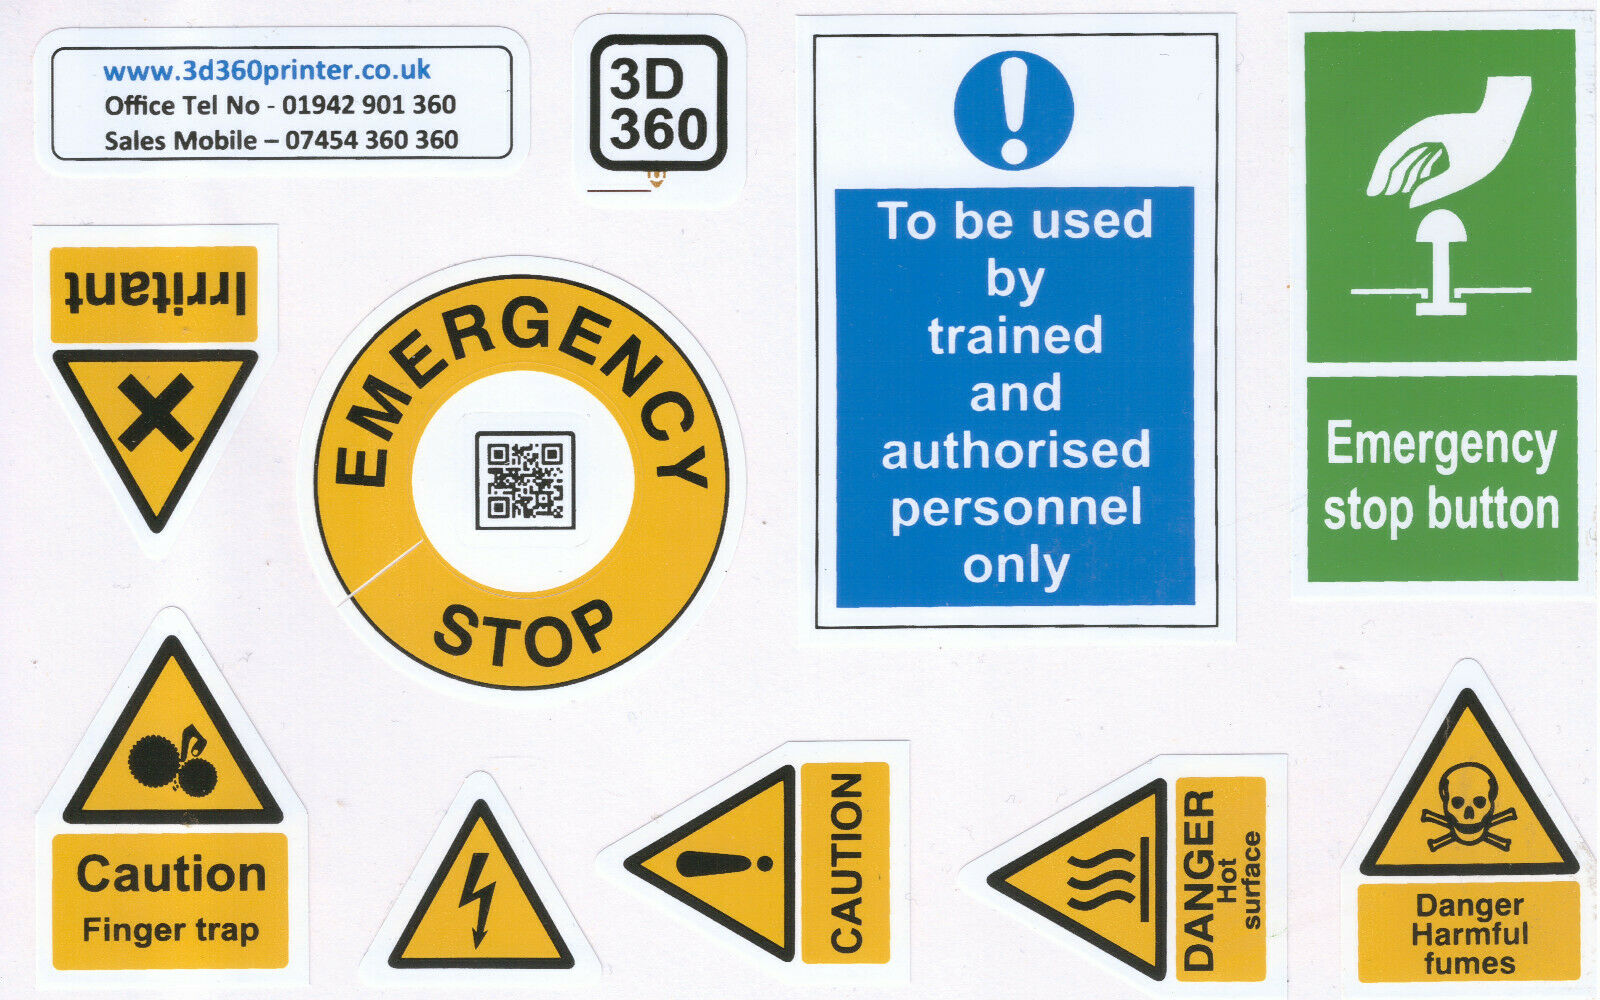 3D Printer Printing EN 7010 Hazard Warning Signs Safety Risk Reduction Stickers